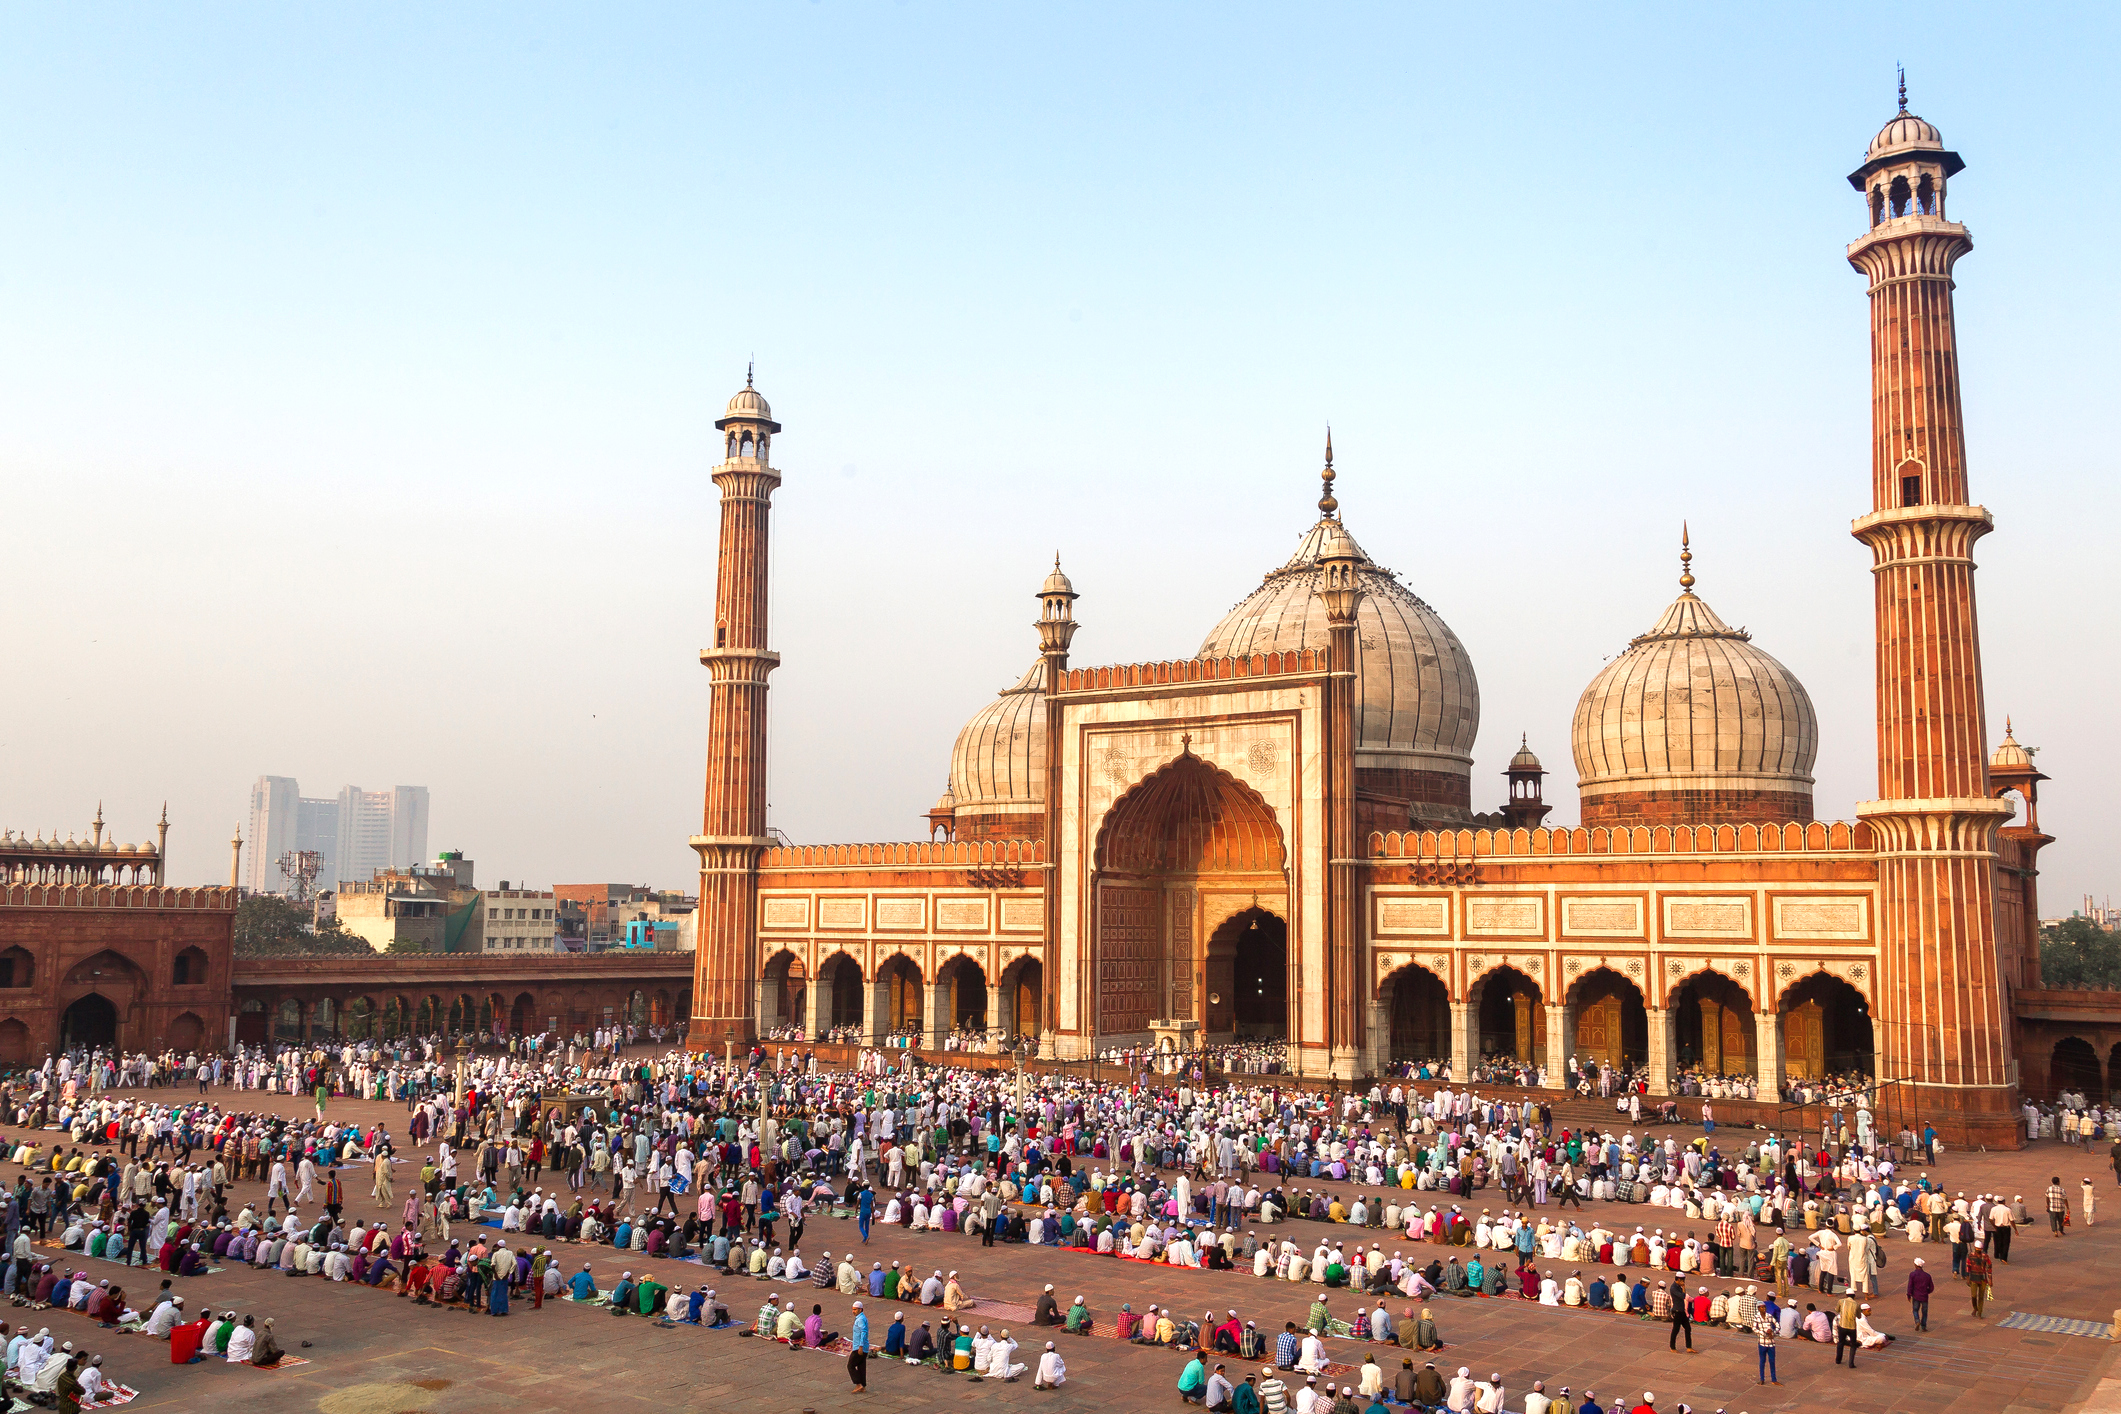 Jama Masjid during the festival of Eid.